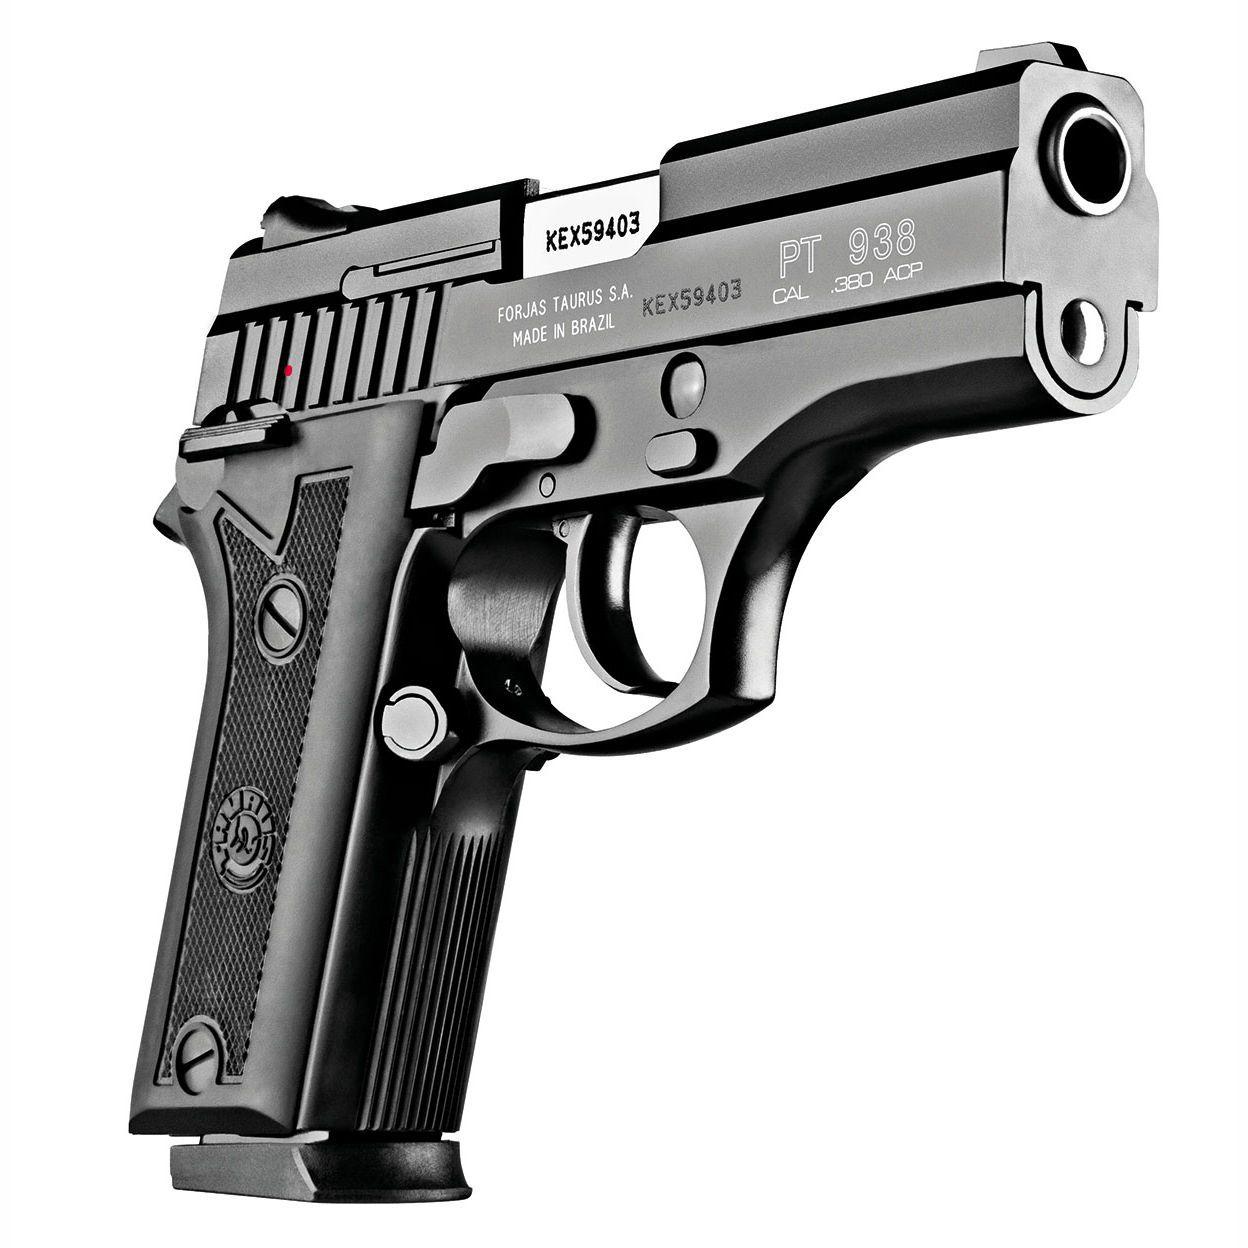 Pistola Taurus PT 938 - Cal. 380 Auto 15+1 Tiros Oxidada Fosco